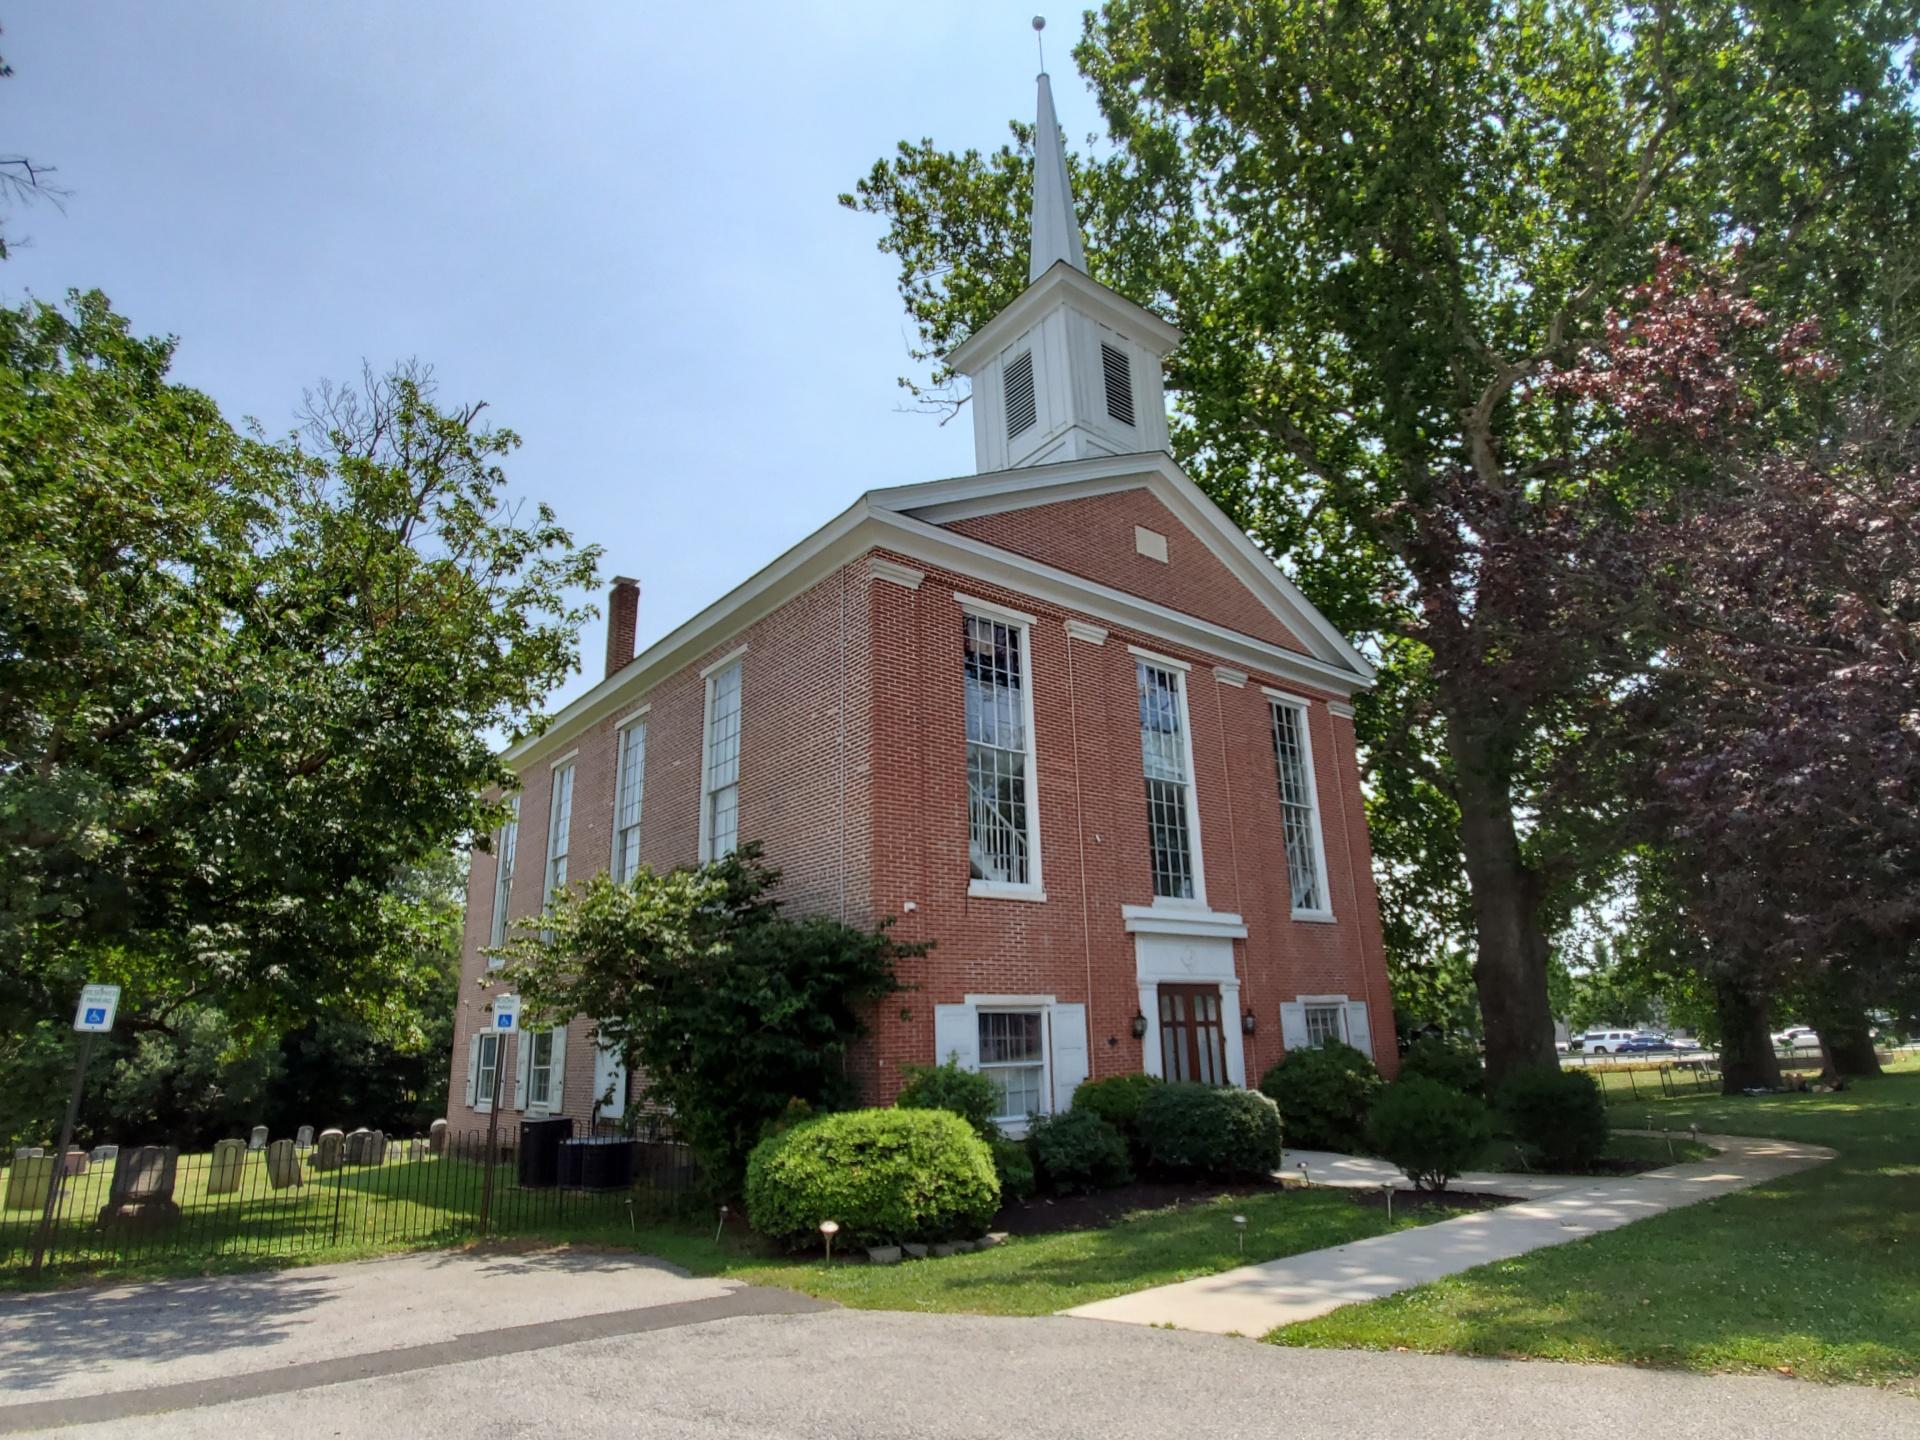 Pencader (Olivet) Presbyterian Church (originally founded 1707-1710; present building established in 1852) - photo credit: R. Andrew Myers